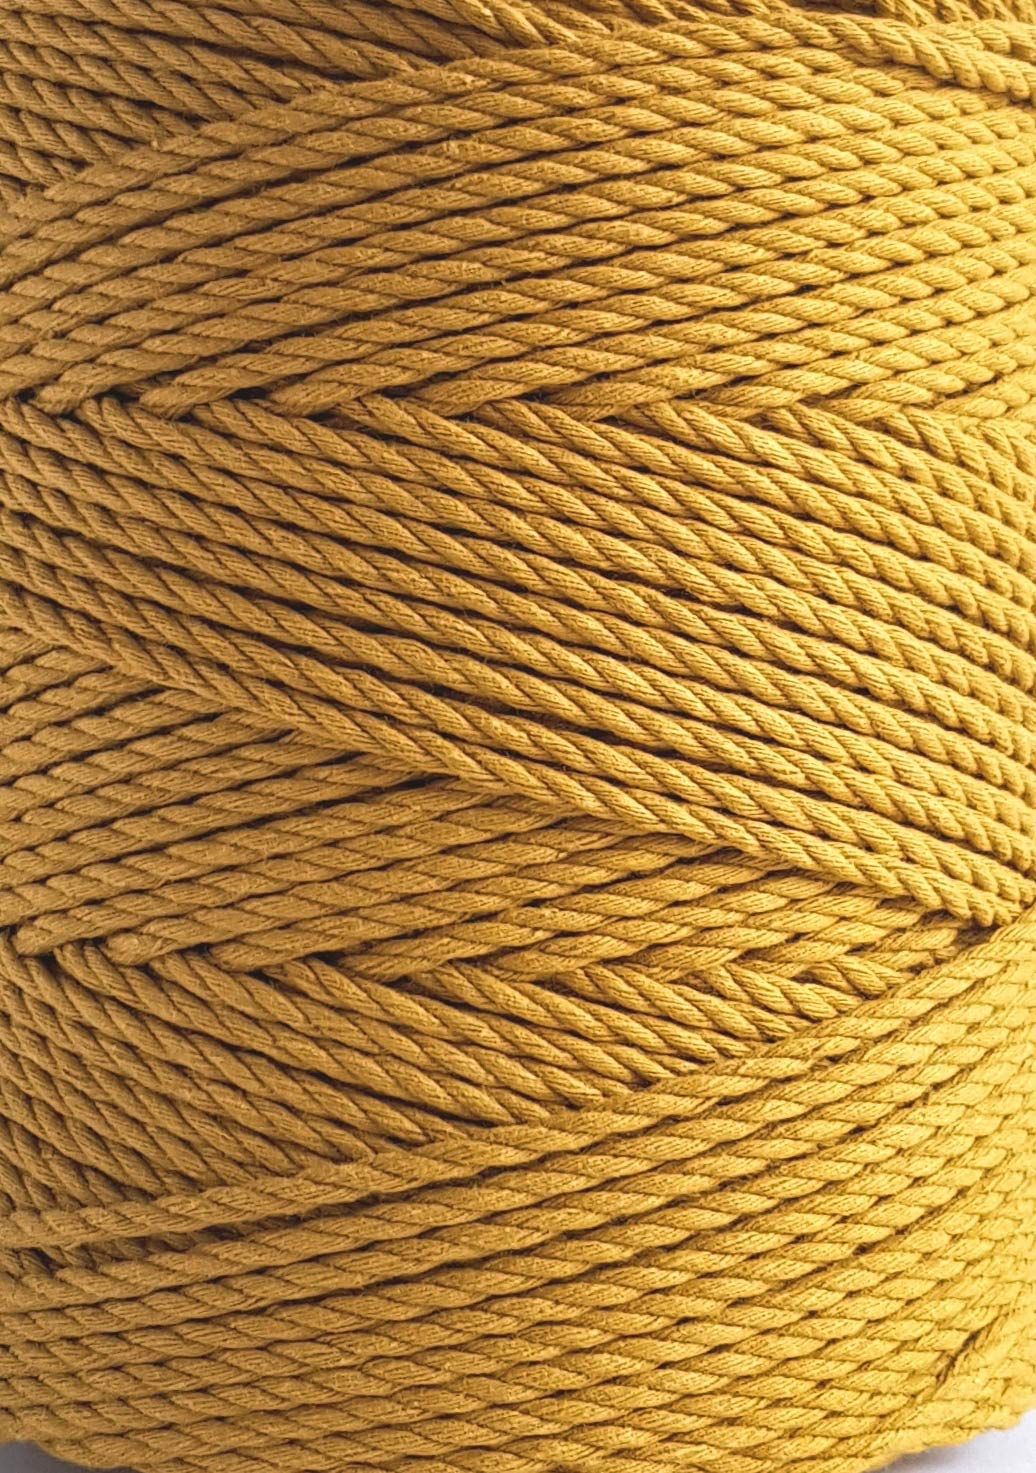 Macrame rope 3mm MUSTARD cotton rope 787 feet mustard macrame cord 262 yard cotton rope for macrame projects 3mm Handmade Decorations Macrame Wall Hangings Plant Hanger Crocheting Bohemia DIY